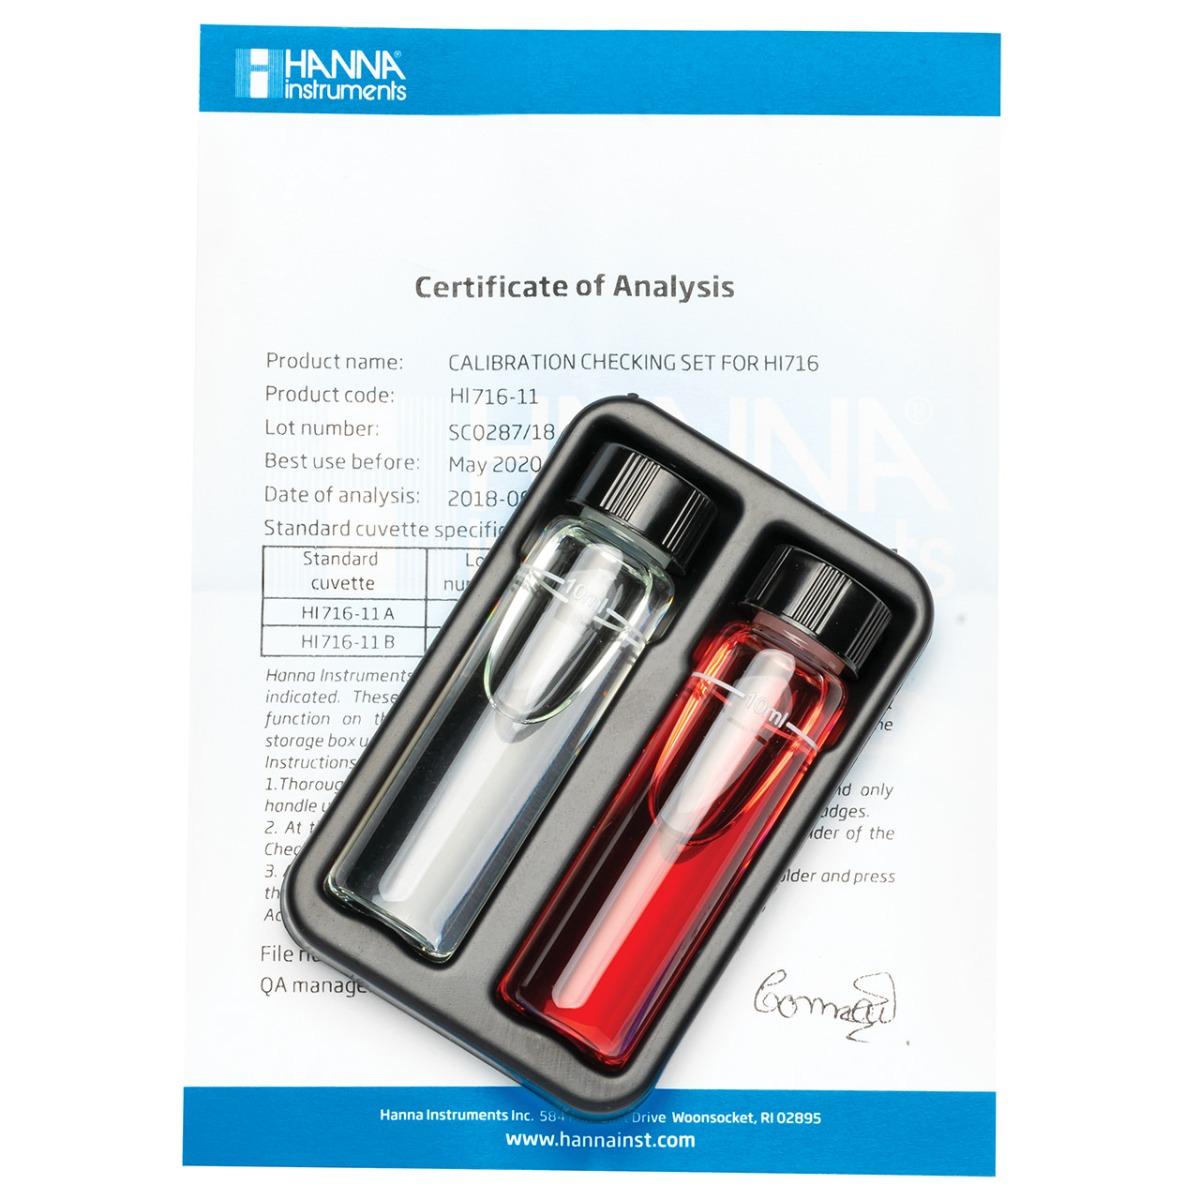 HI716-11 Bromine Checker®HC Calibration Set